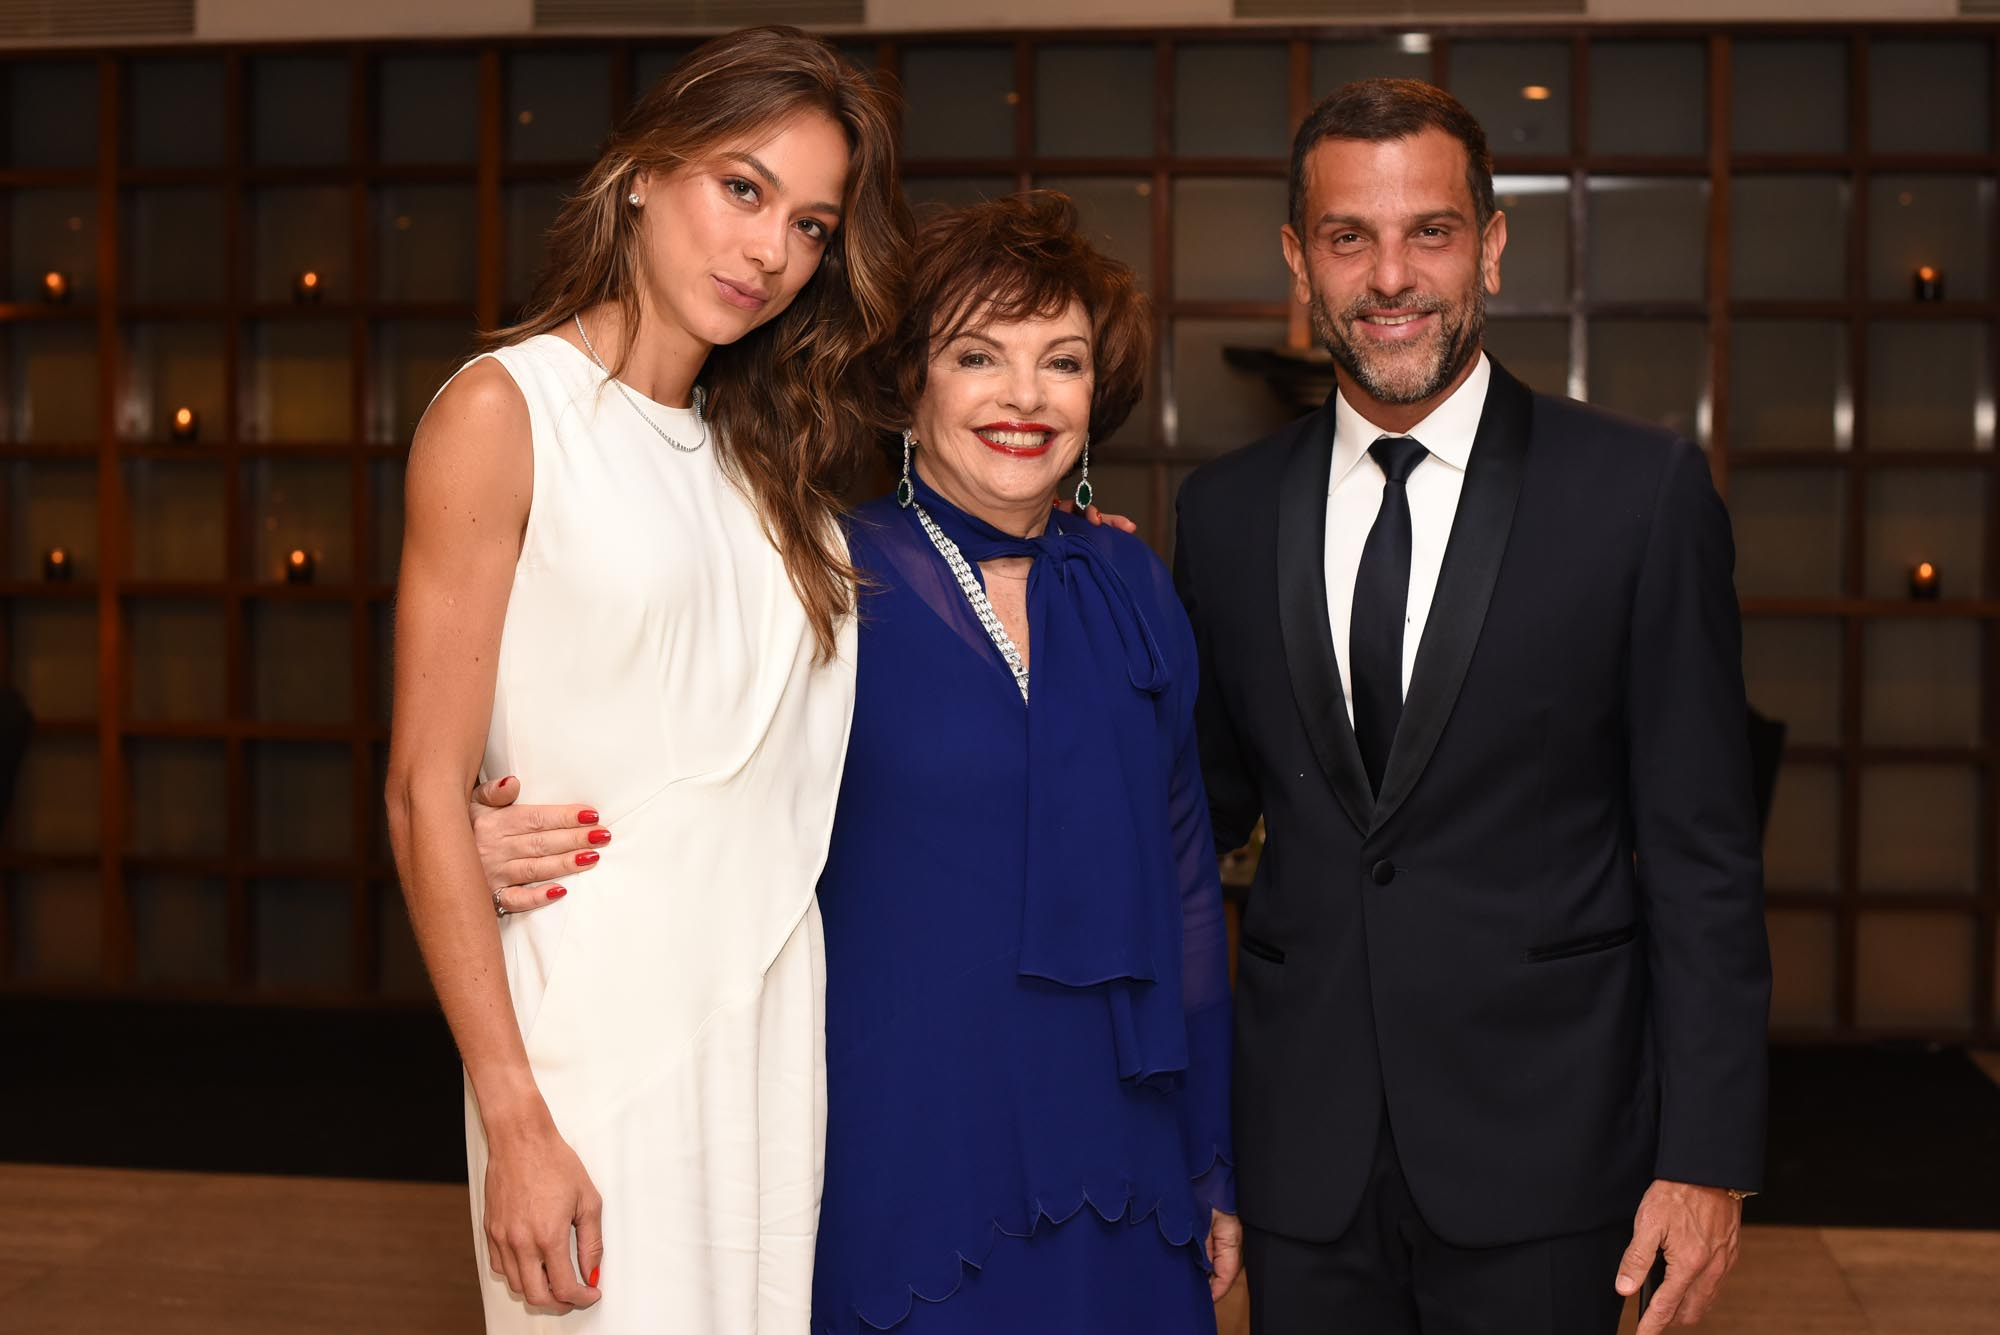 Ellen Capri, Anna Schvartzman, Alexandre Birman V BrazilFoundation Gala São Paulo Chanel 2018 Filantropia Brasil Philanthropy Brazil